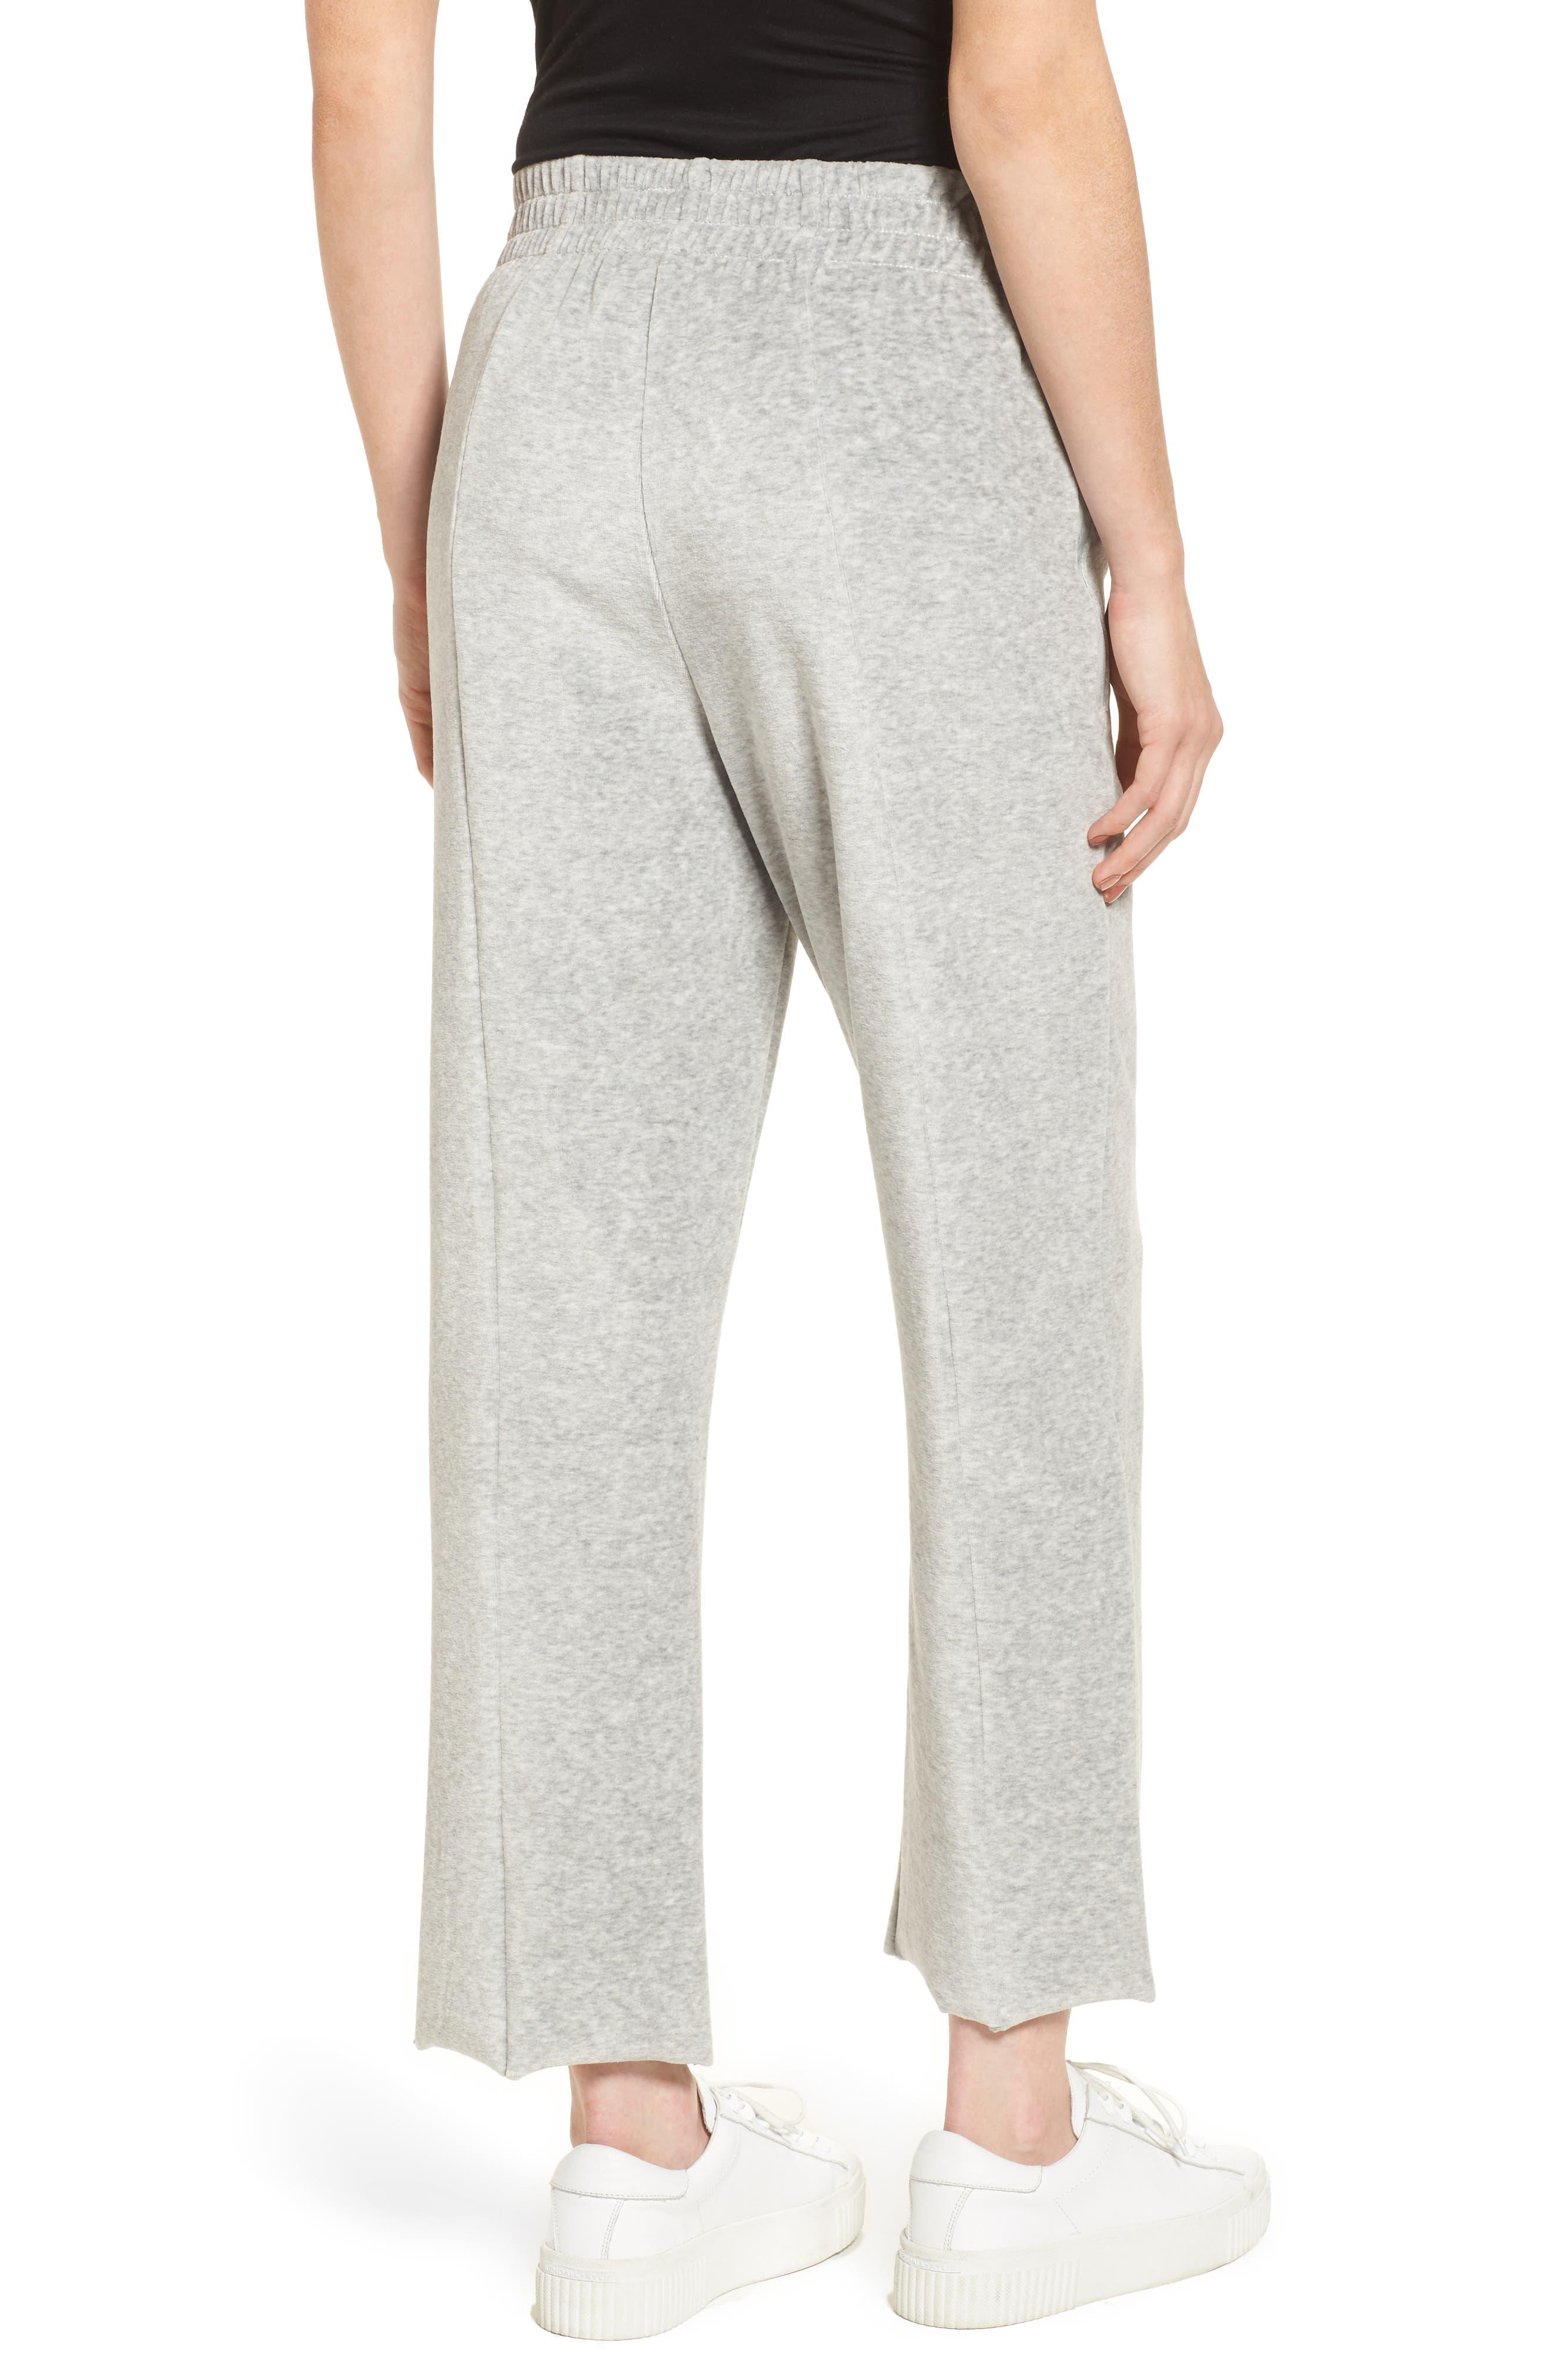 Alternate Image 2  - Good American Good Sweats The High Waist Sweatpants (Regular & Plus Size)